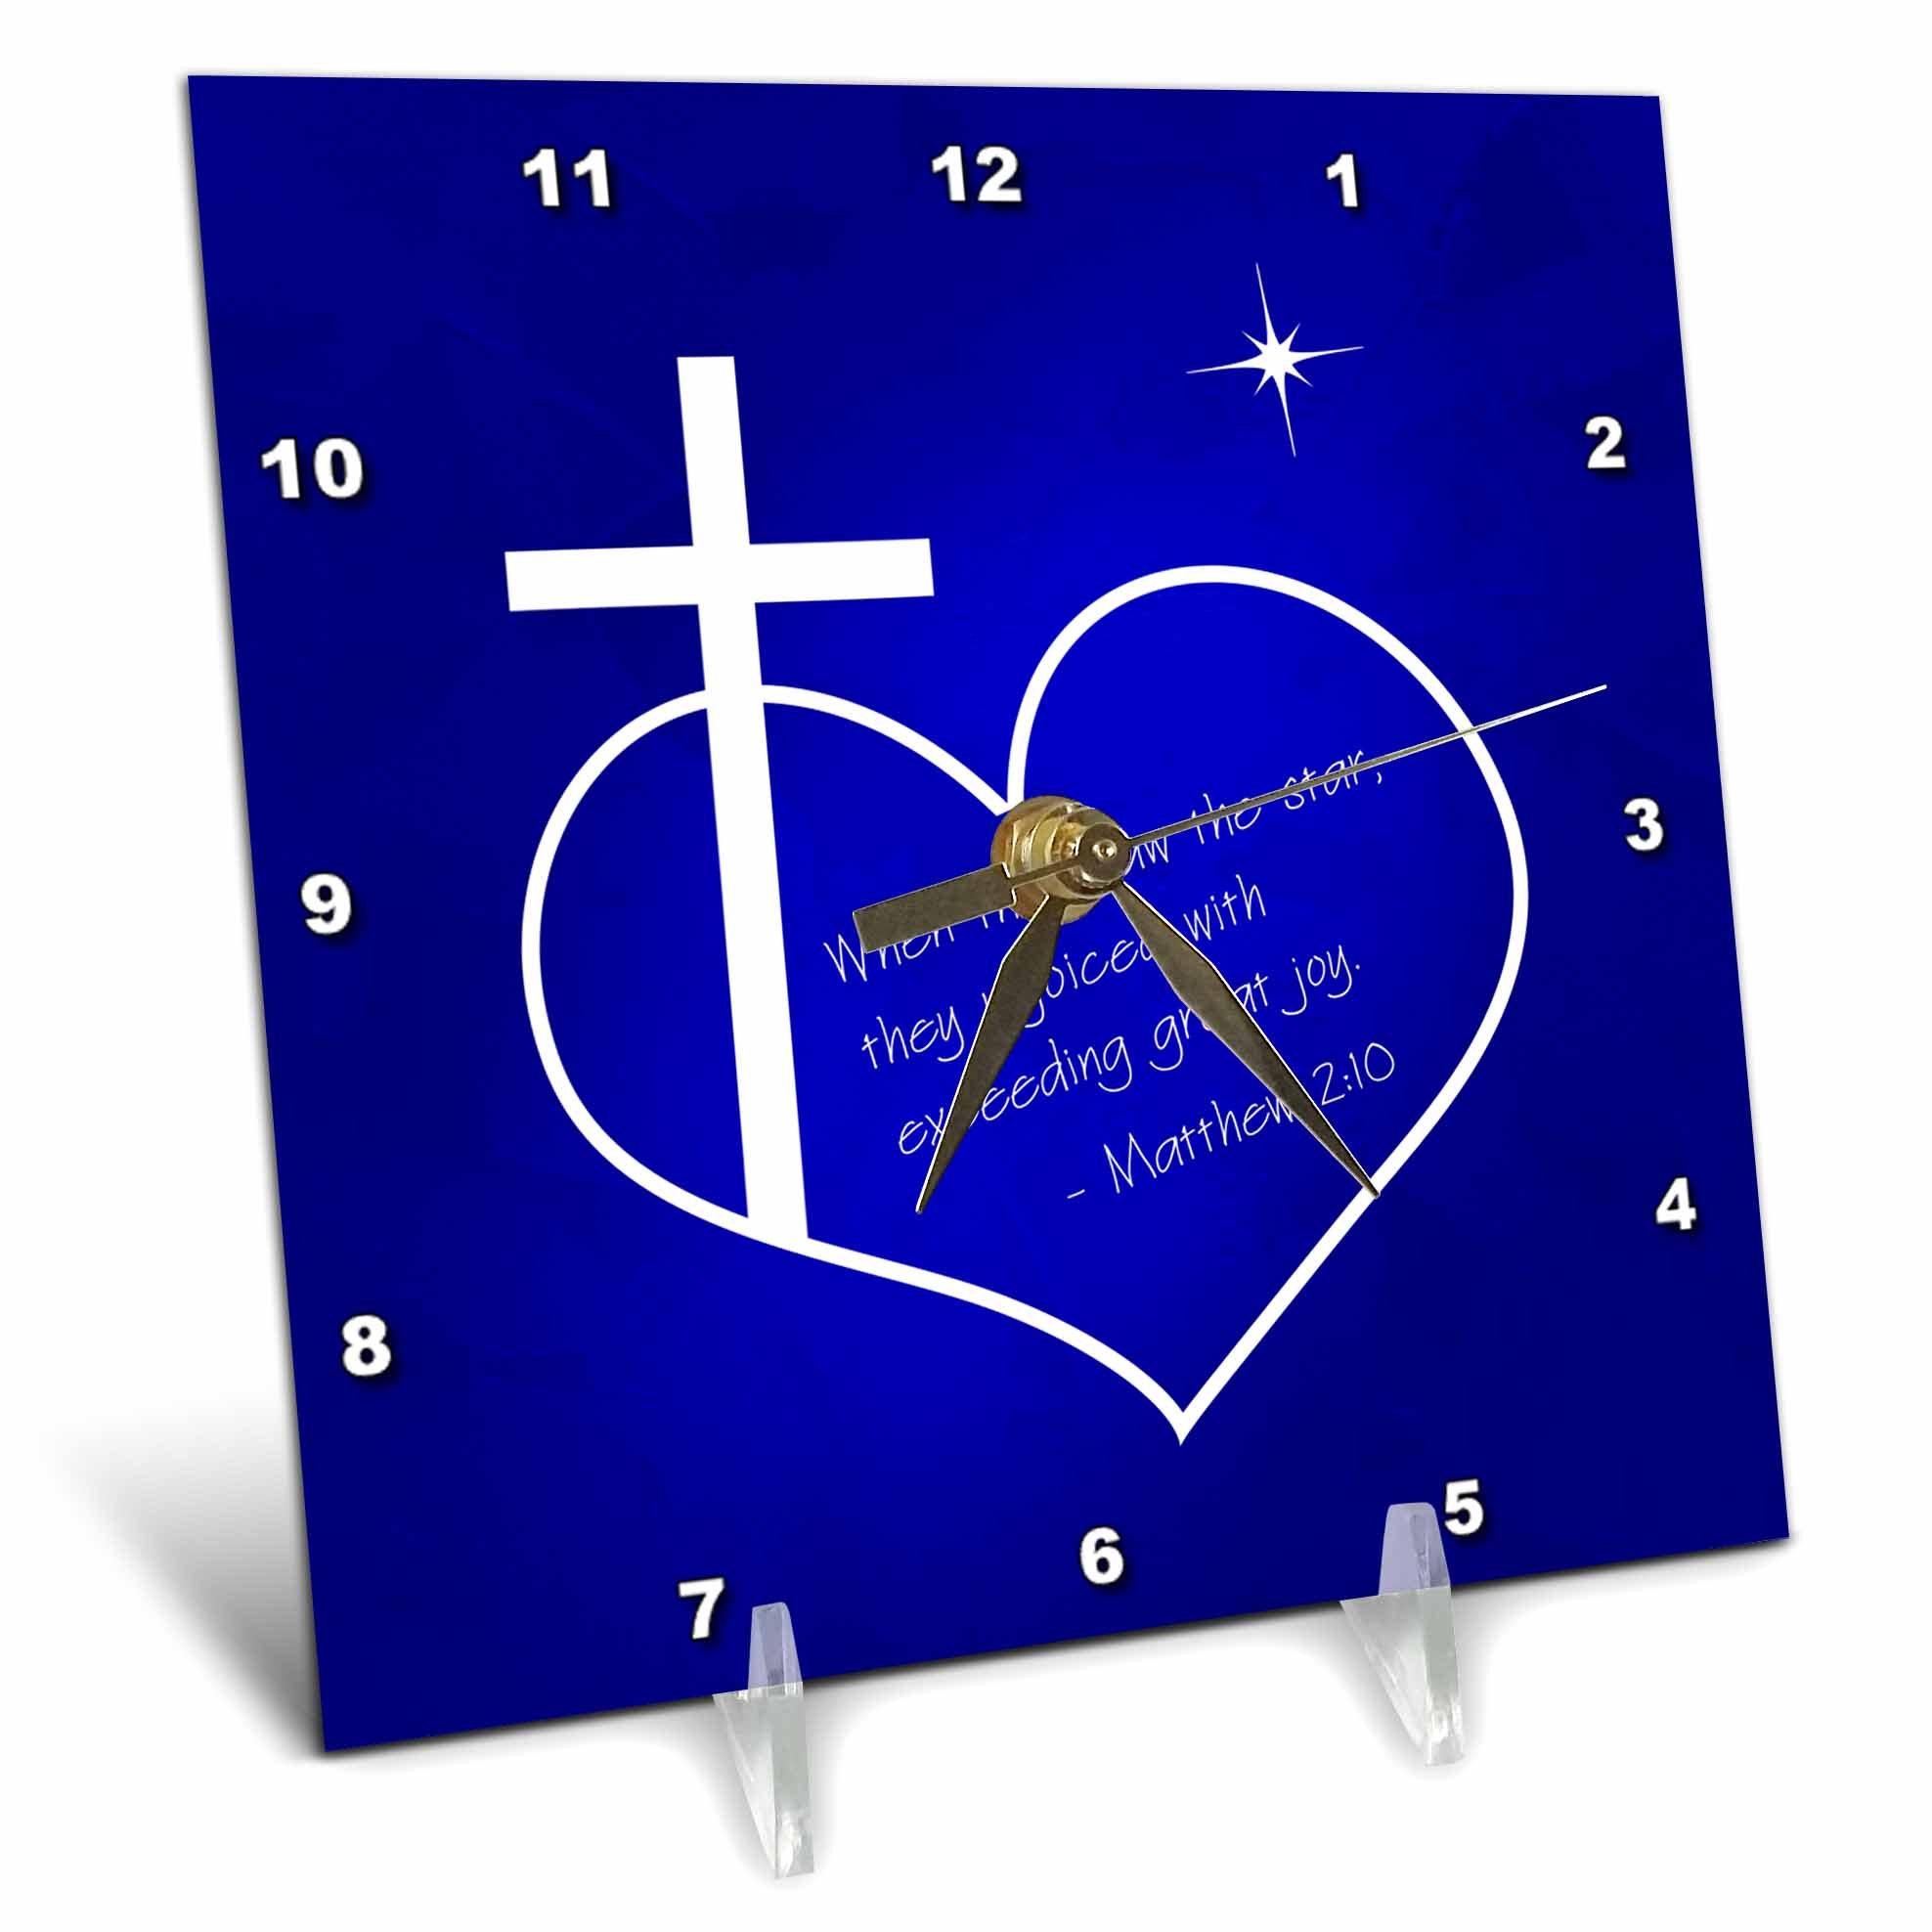 3dRose Cross, Heart, Star, Bible Quote Christian Christmas Desk Clock, 6'' x 6'', Blue